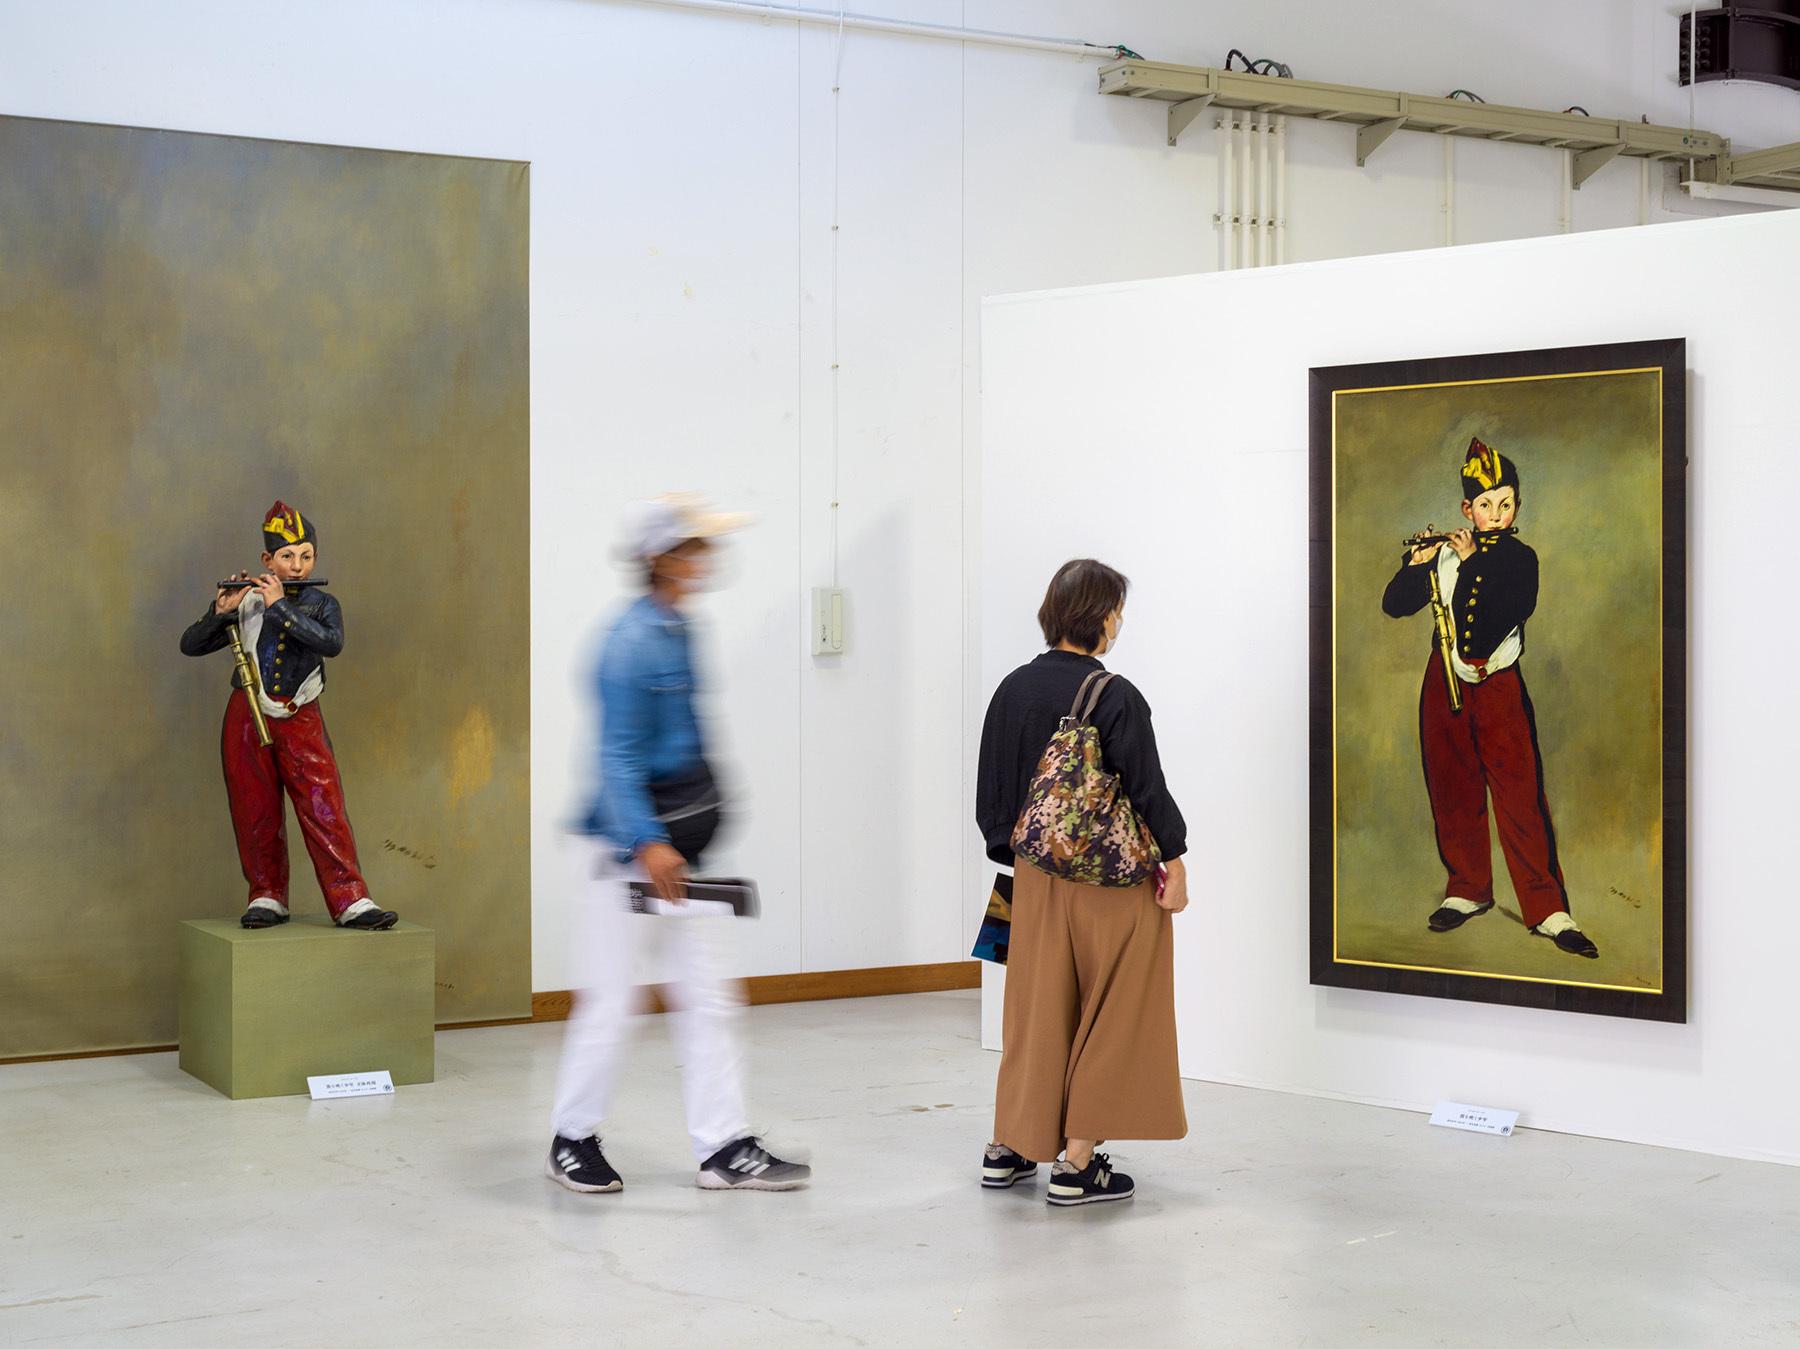 東京藝術大学「スーパークローン文化財展」_c0028861_14432367.jpg